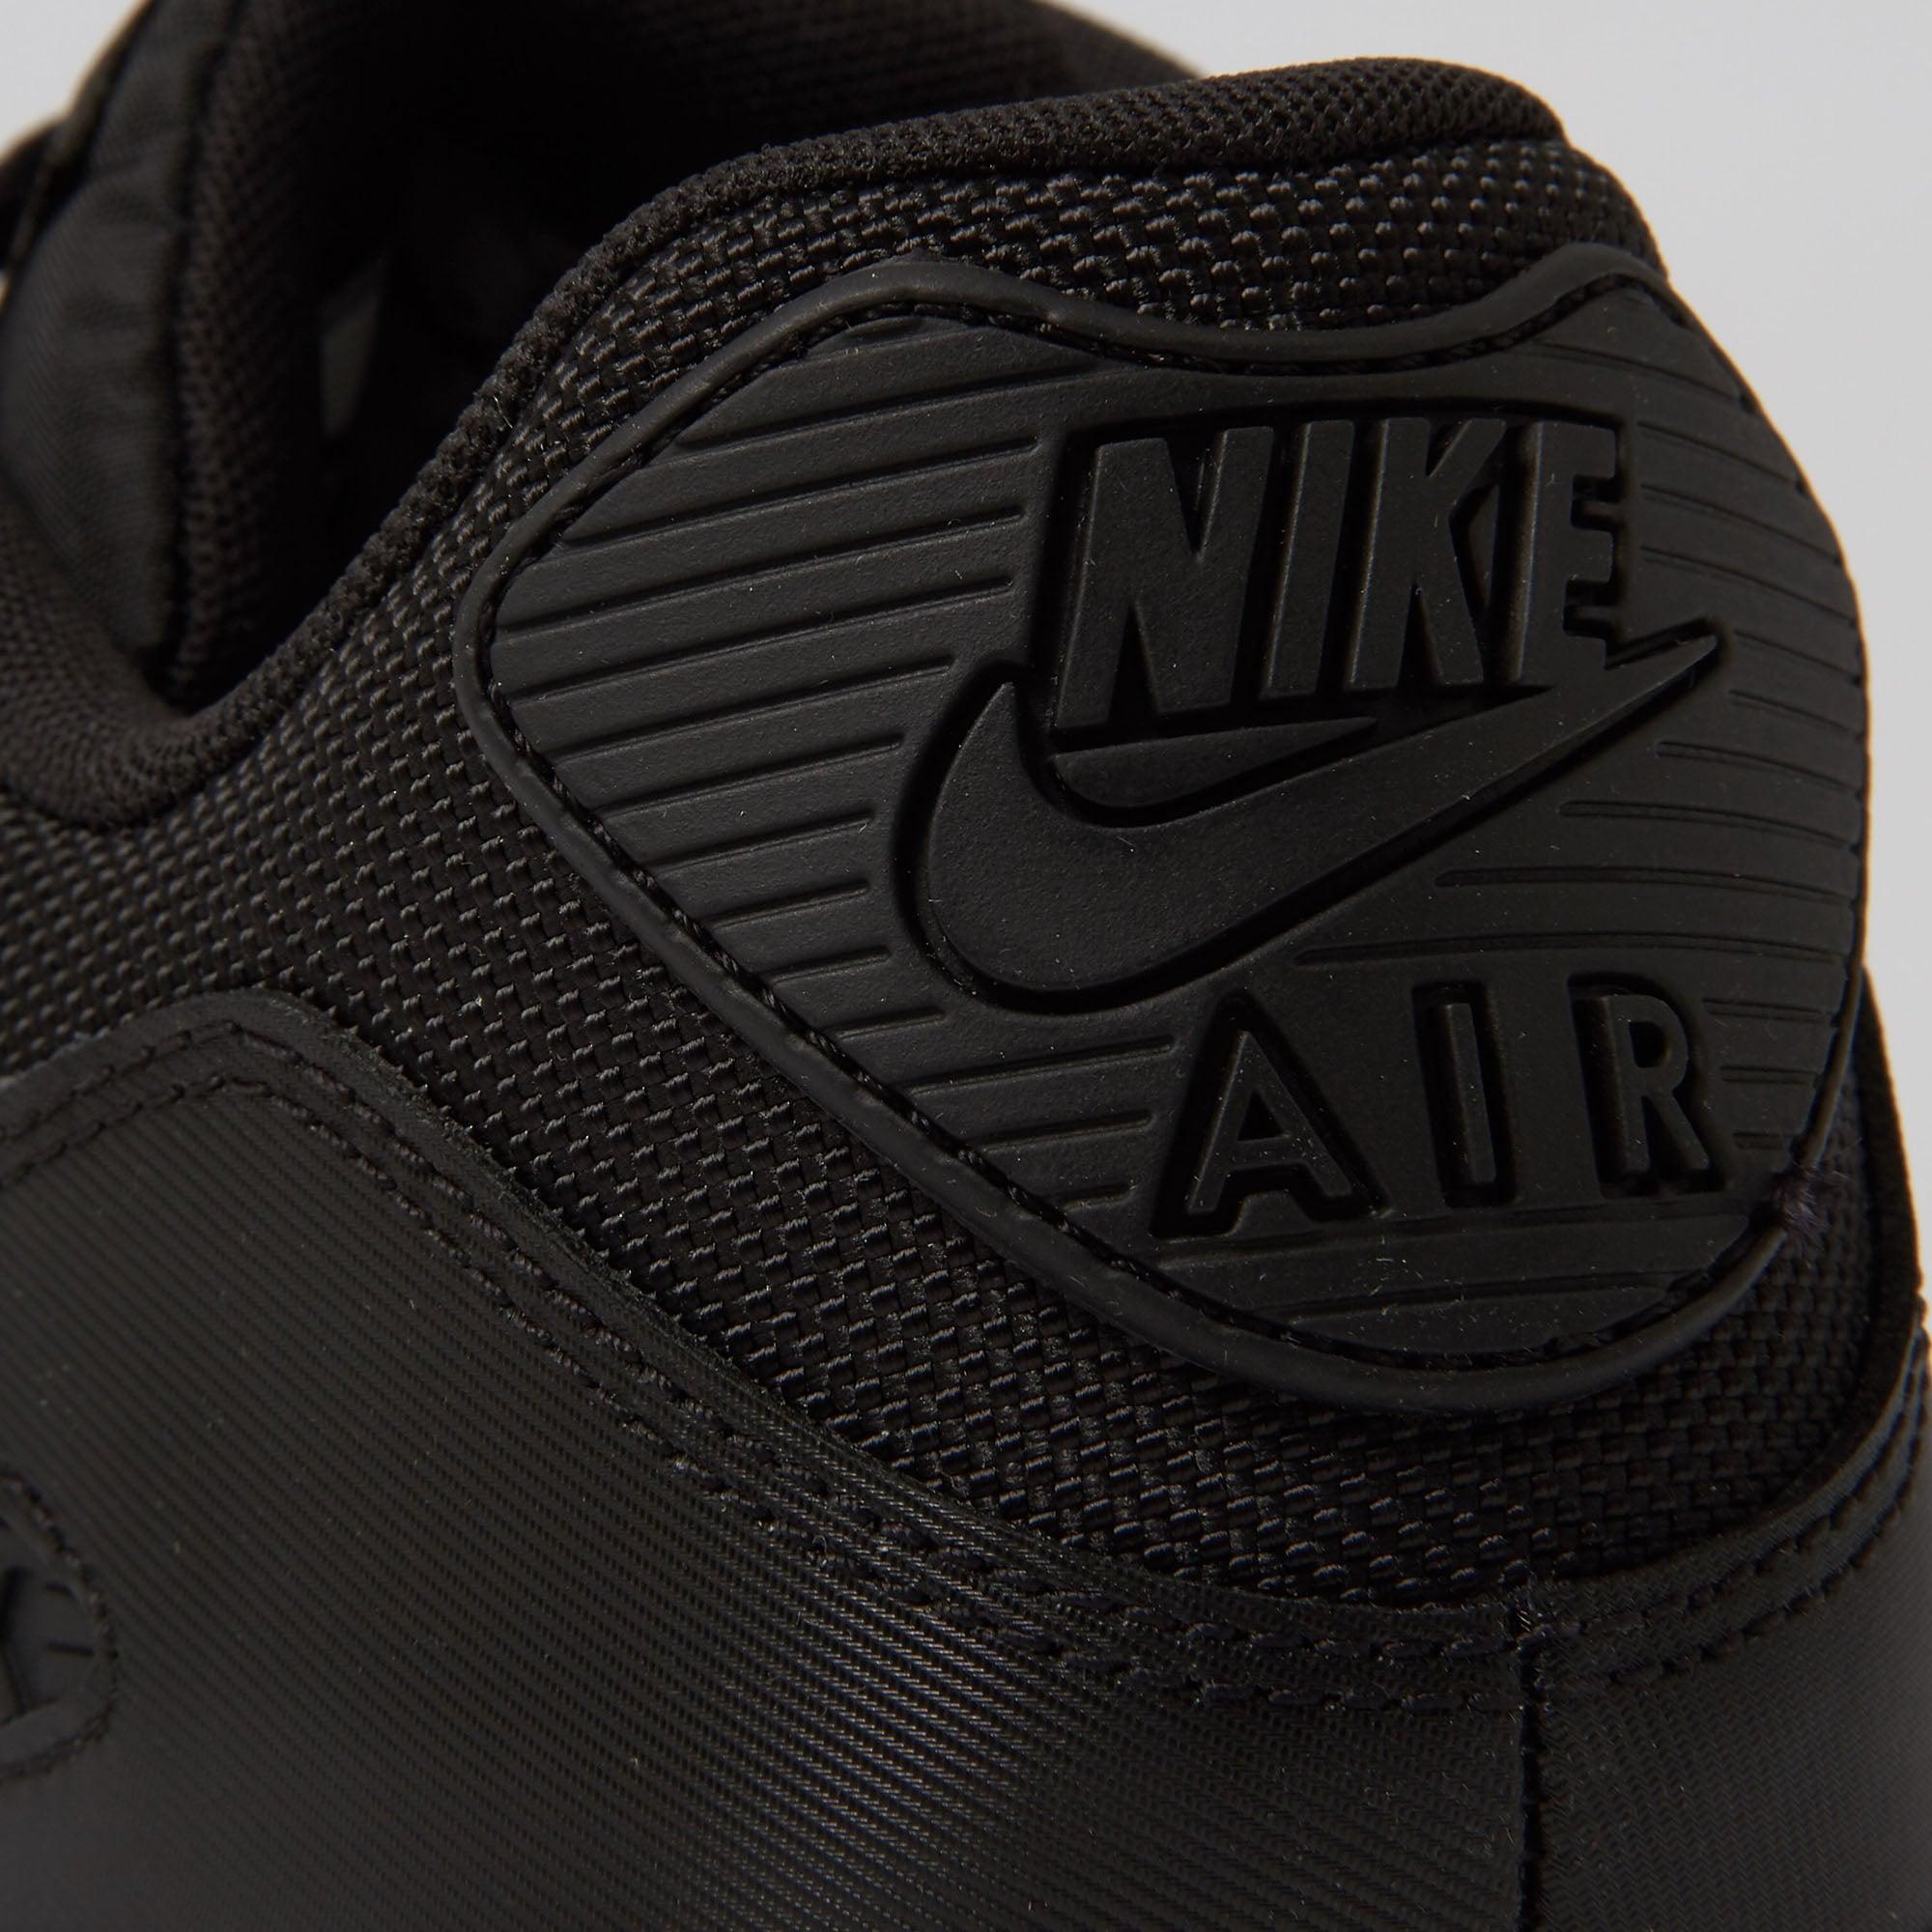 16a30b07f6 inexpensive nike air max 90 essential black trainers 537384 c598d ce272